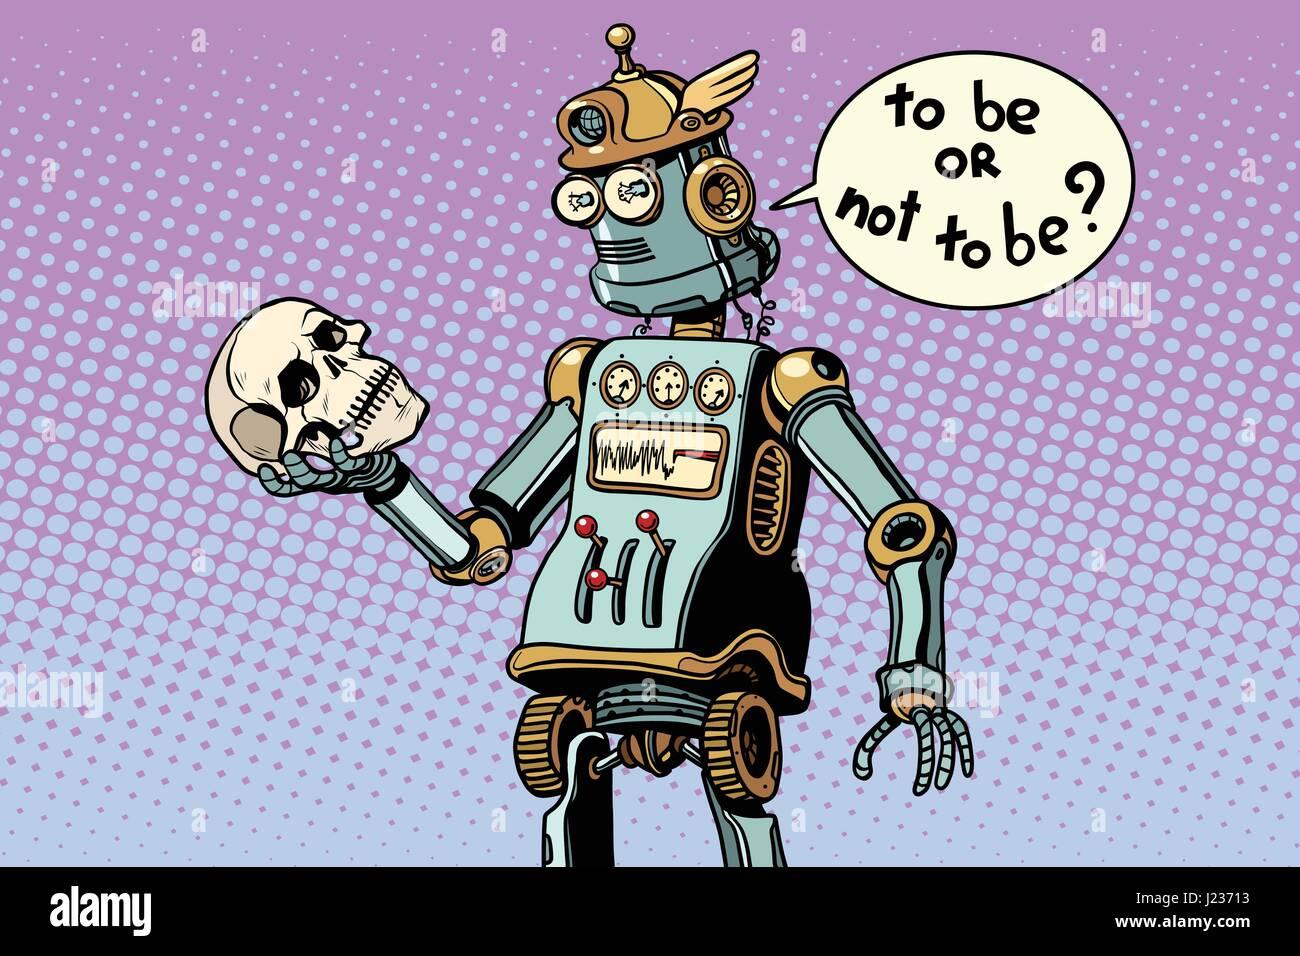 robots and humanity, a scene from hamlet. Pop art retro vector illustration - Stock Vector